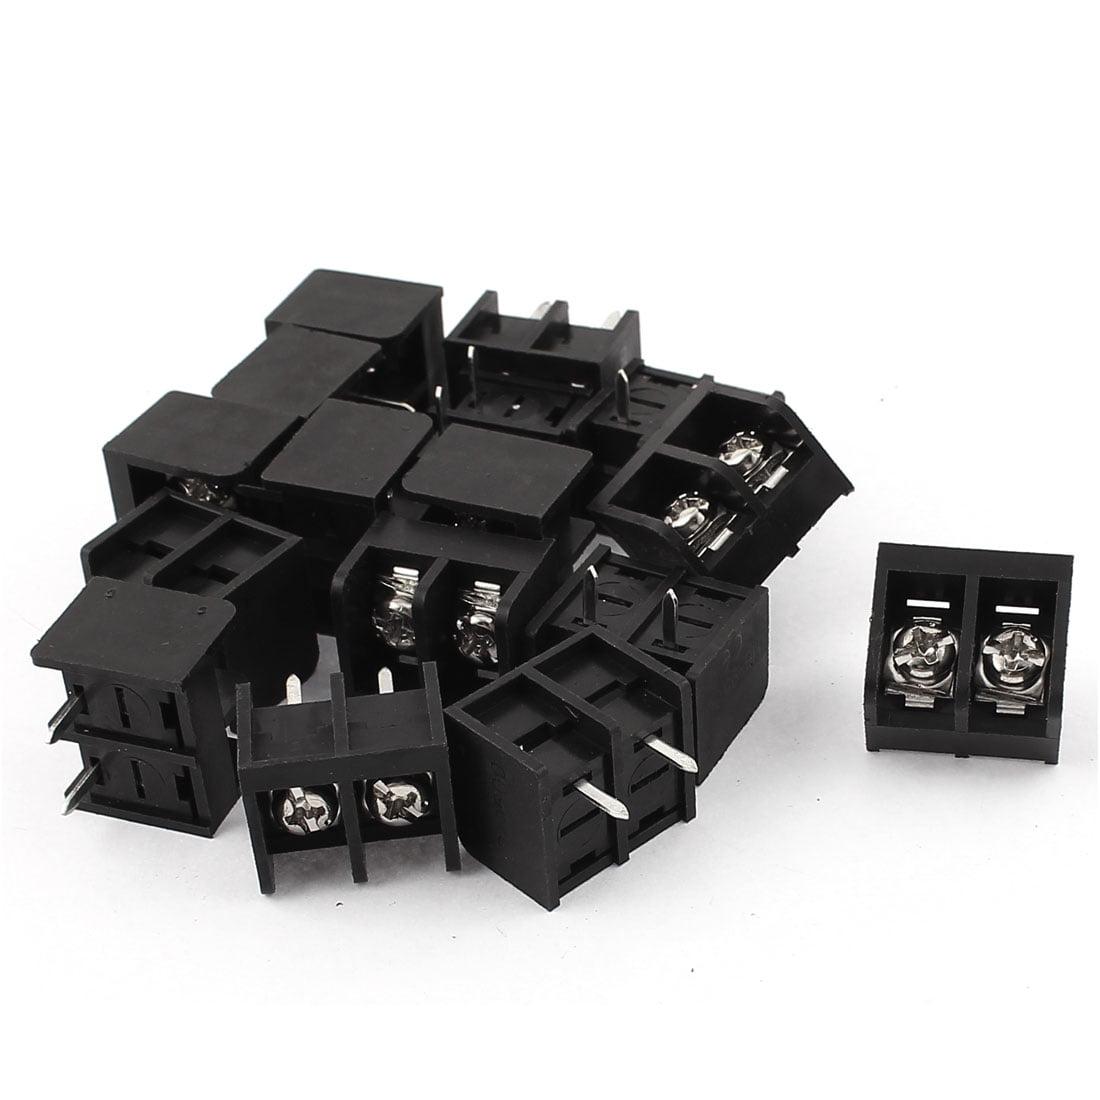 Unique Bargains 16pcs 300V 25A 2 Position Single Row PCB Board Black Screw Terminal Block